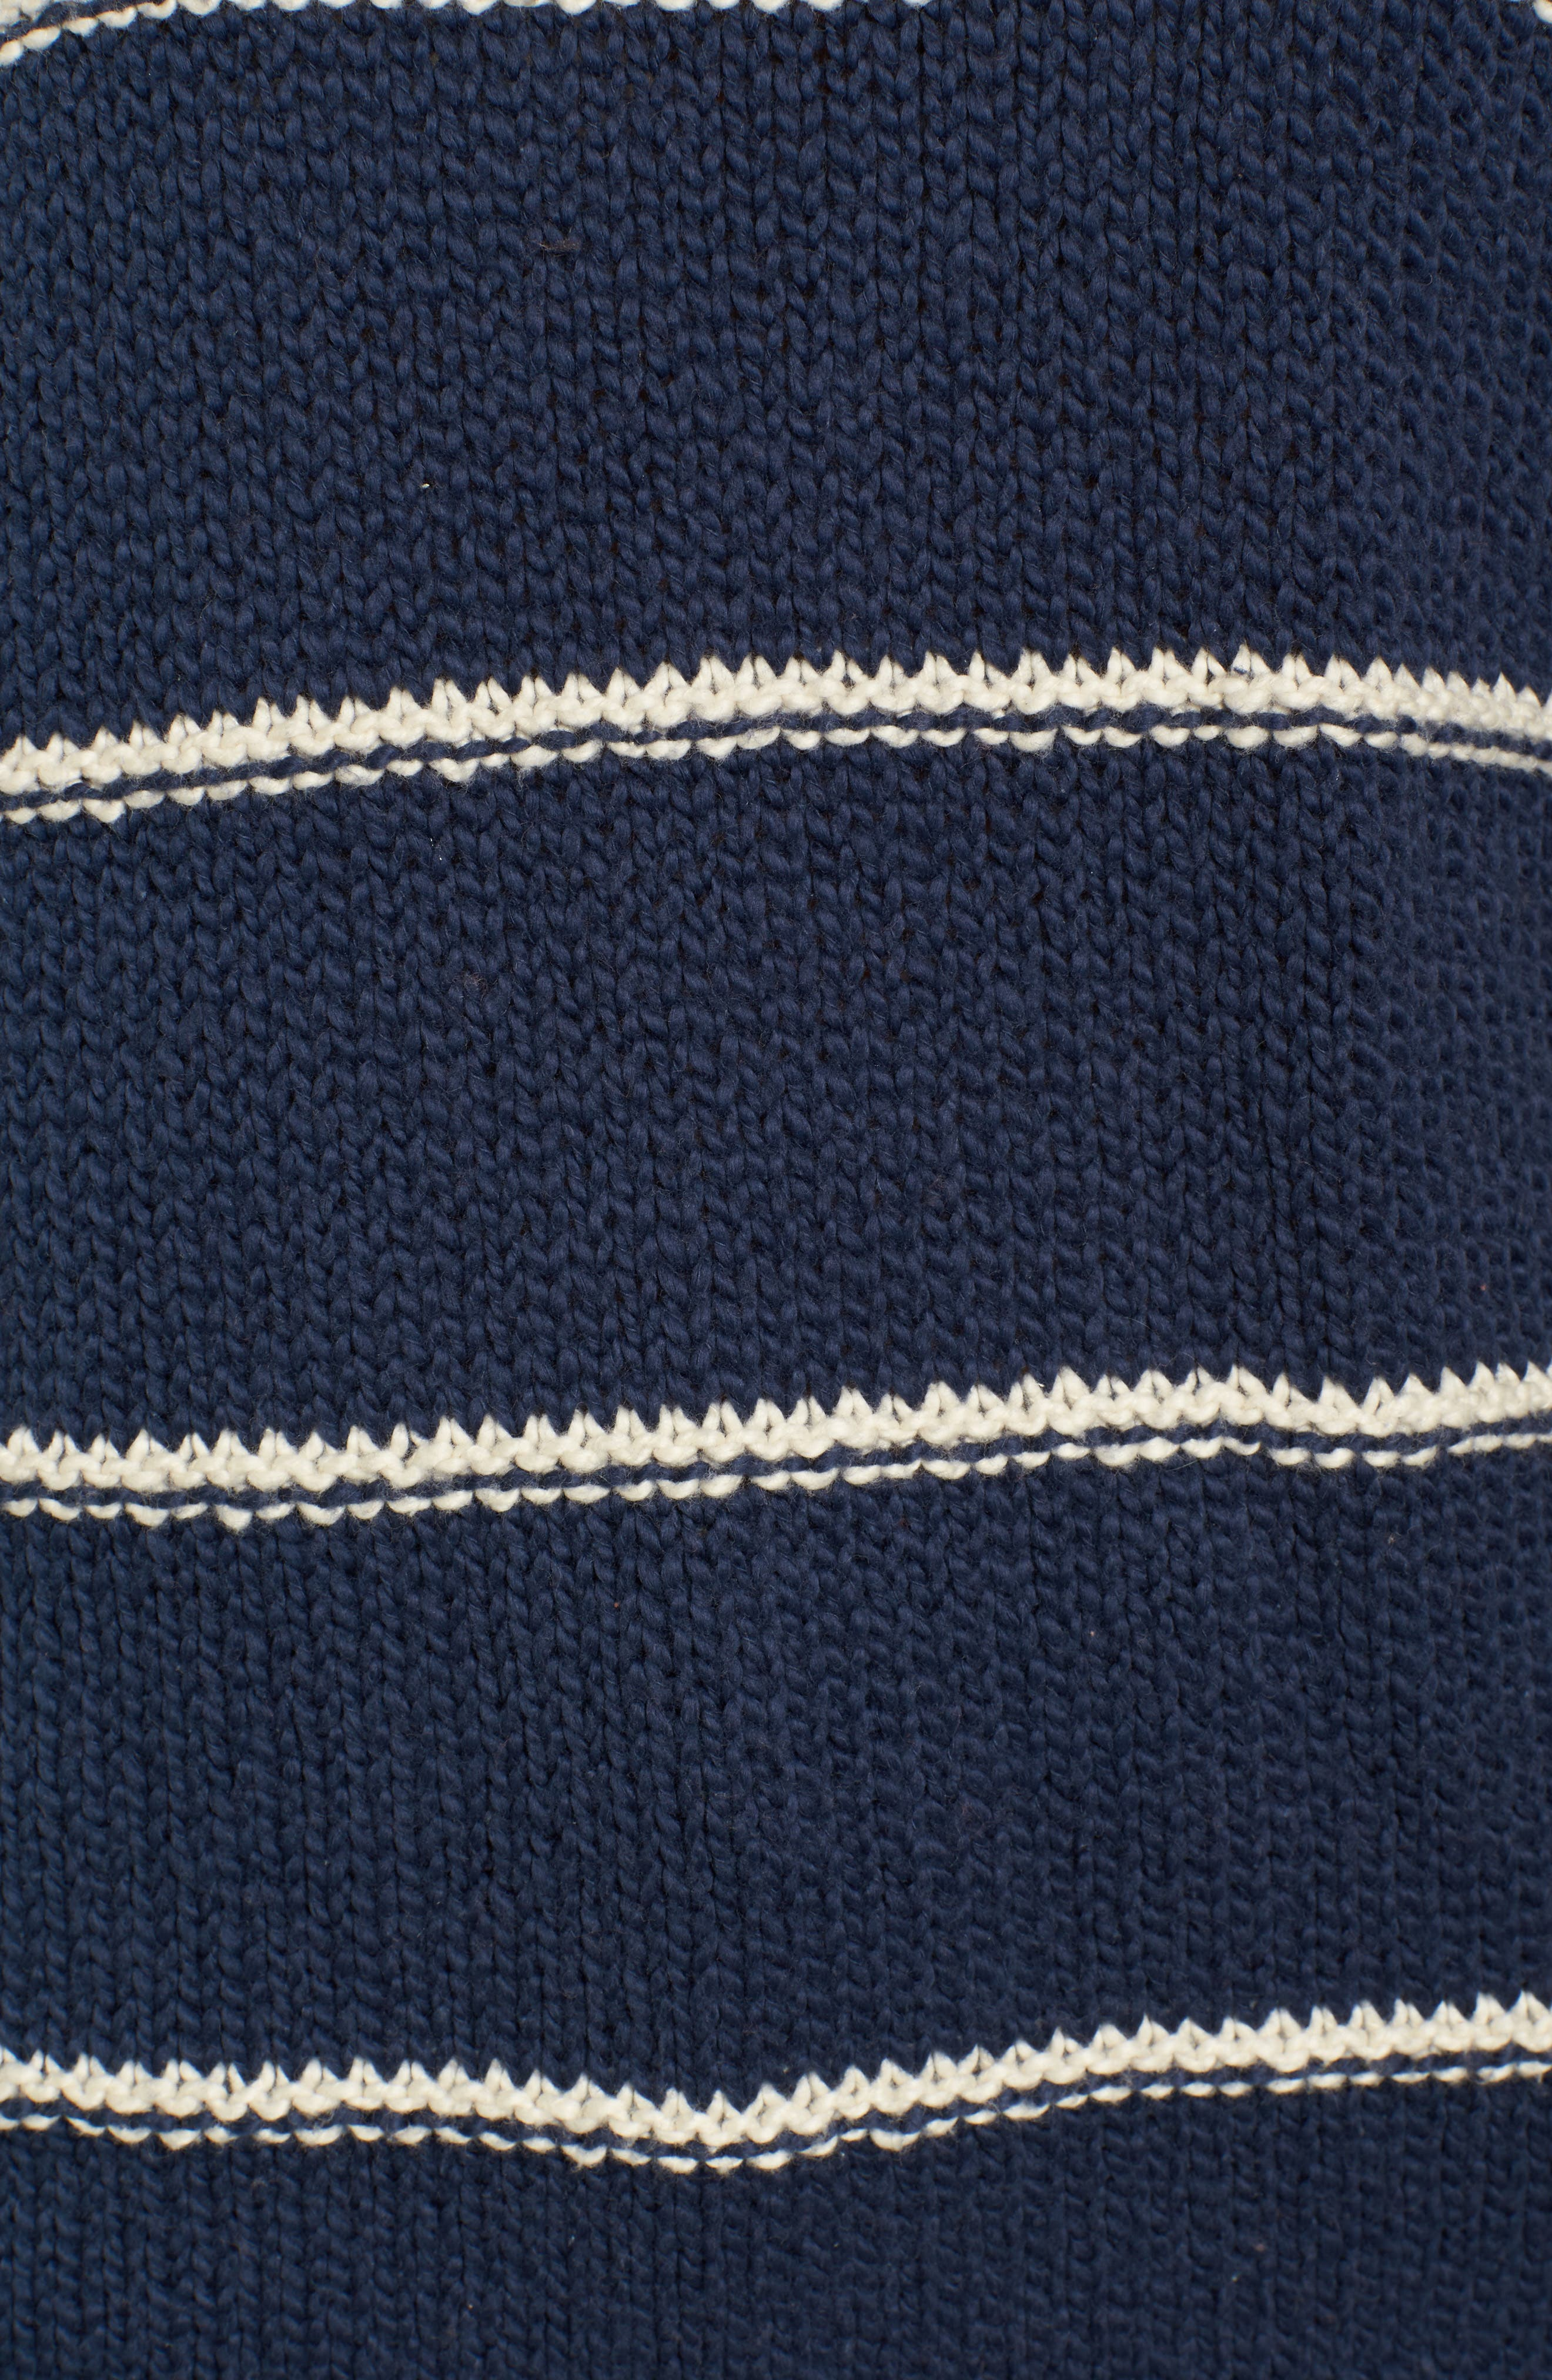 BILLABONG,                             Snuggle Down Off the Shoulder Sweater,                             Alternate thumbnail 5, color,                             400